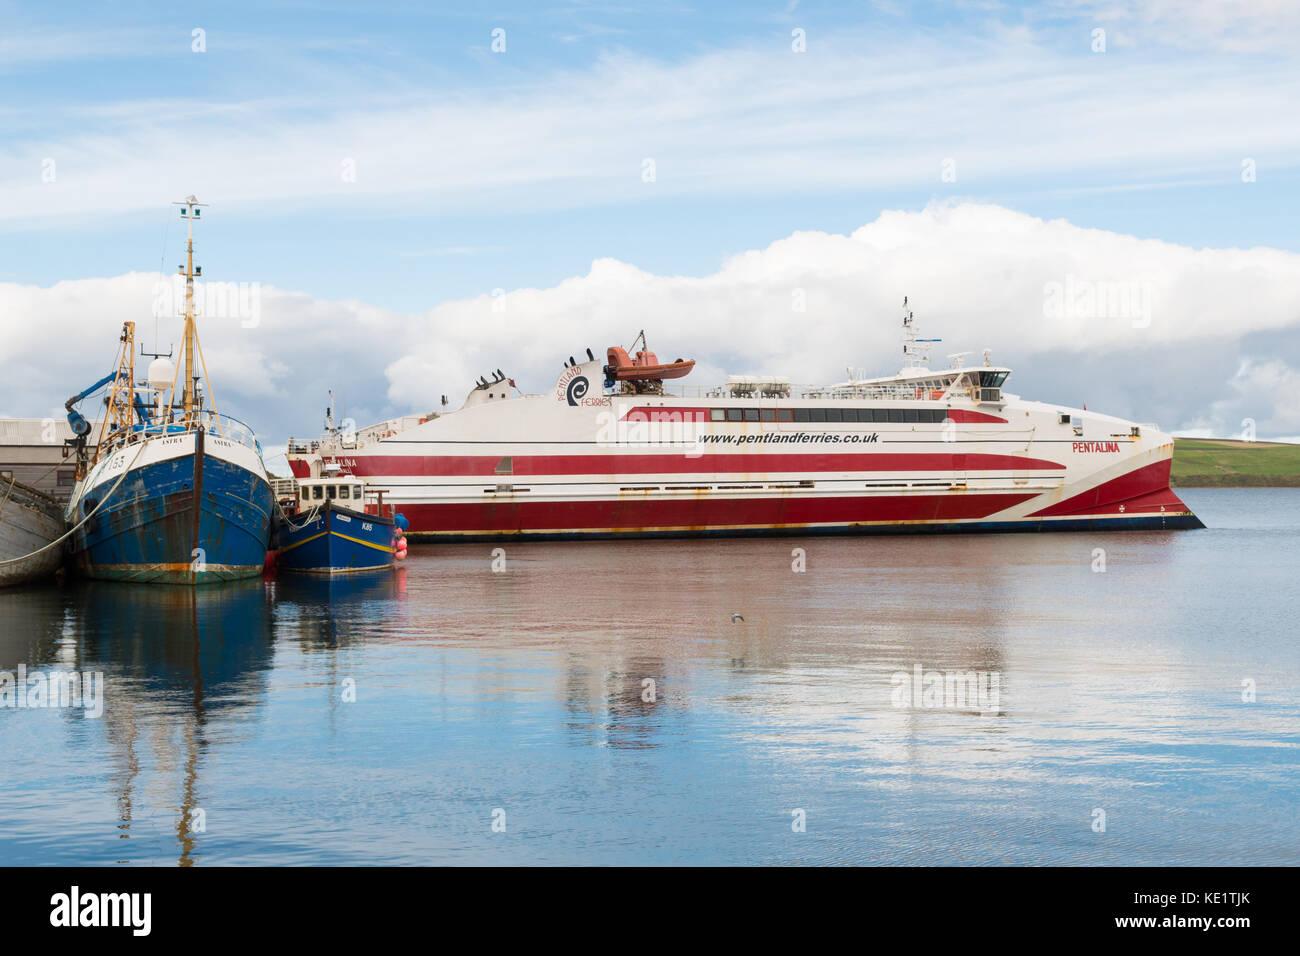 Pentland Ferries, St Margarets Hope, Orkney, Scotland, UK - Stock Image